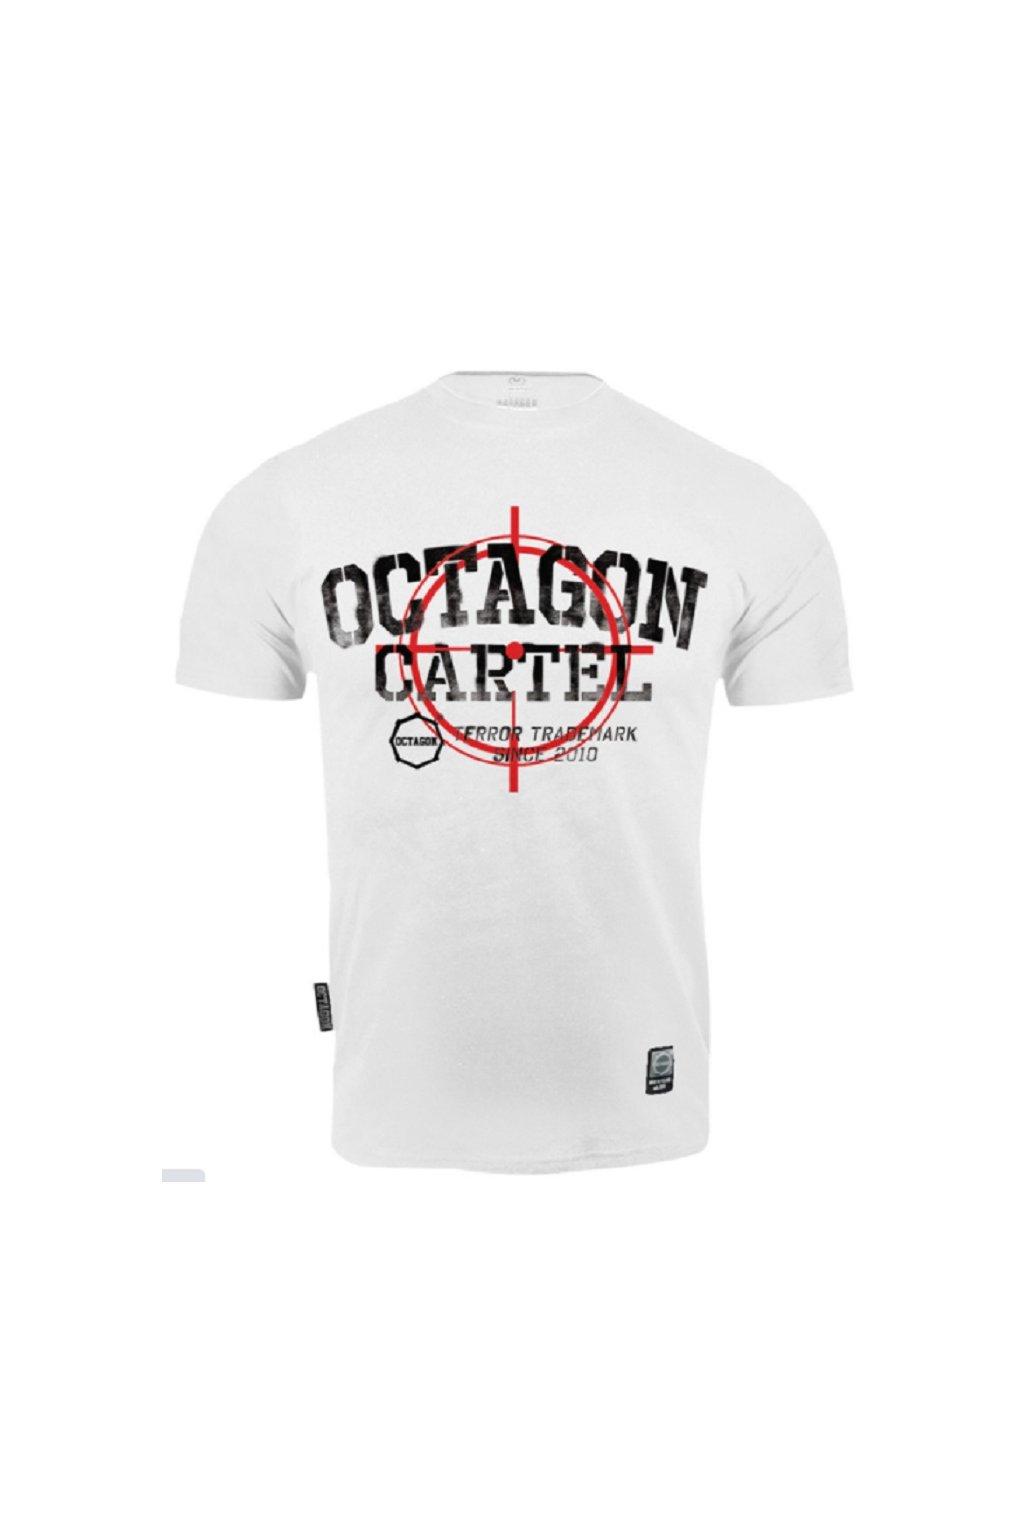 Pánské tričko OCTAGON CARTEL BÍLÁ obr1